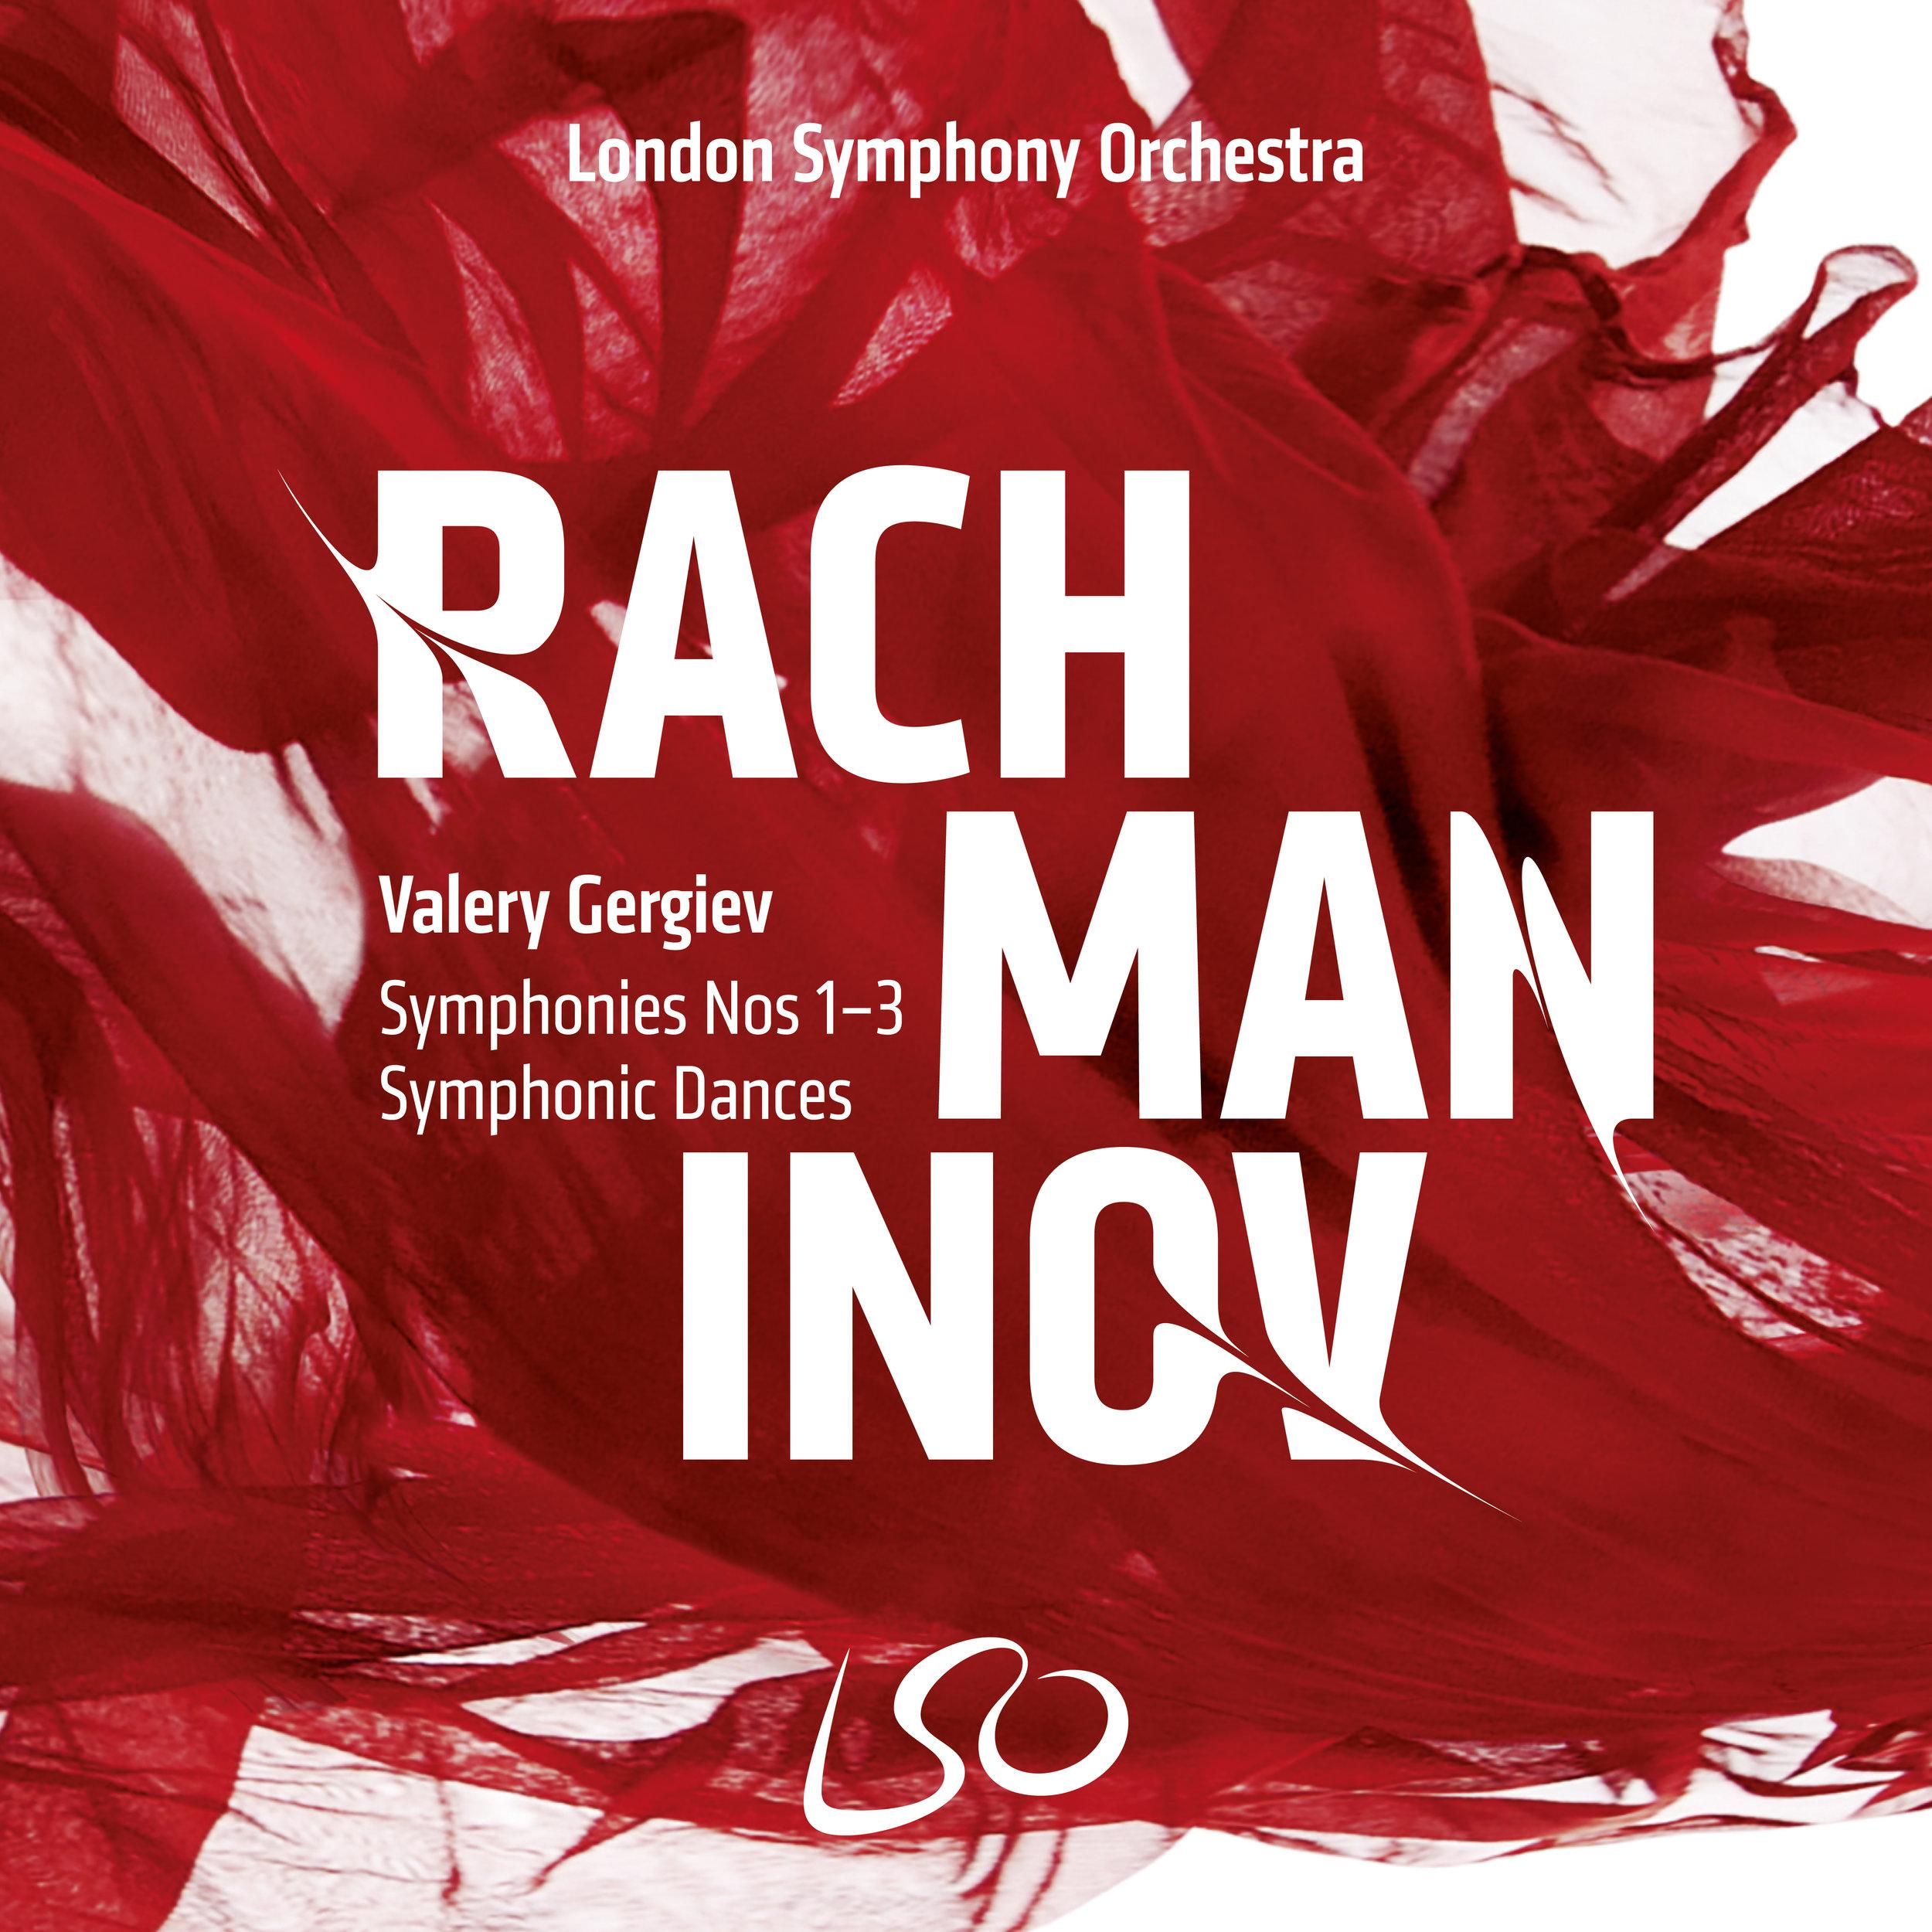 V-2018-46_LSO_Rachmaninov.jpg